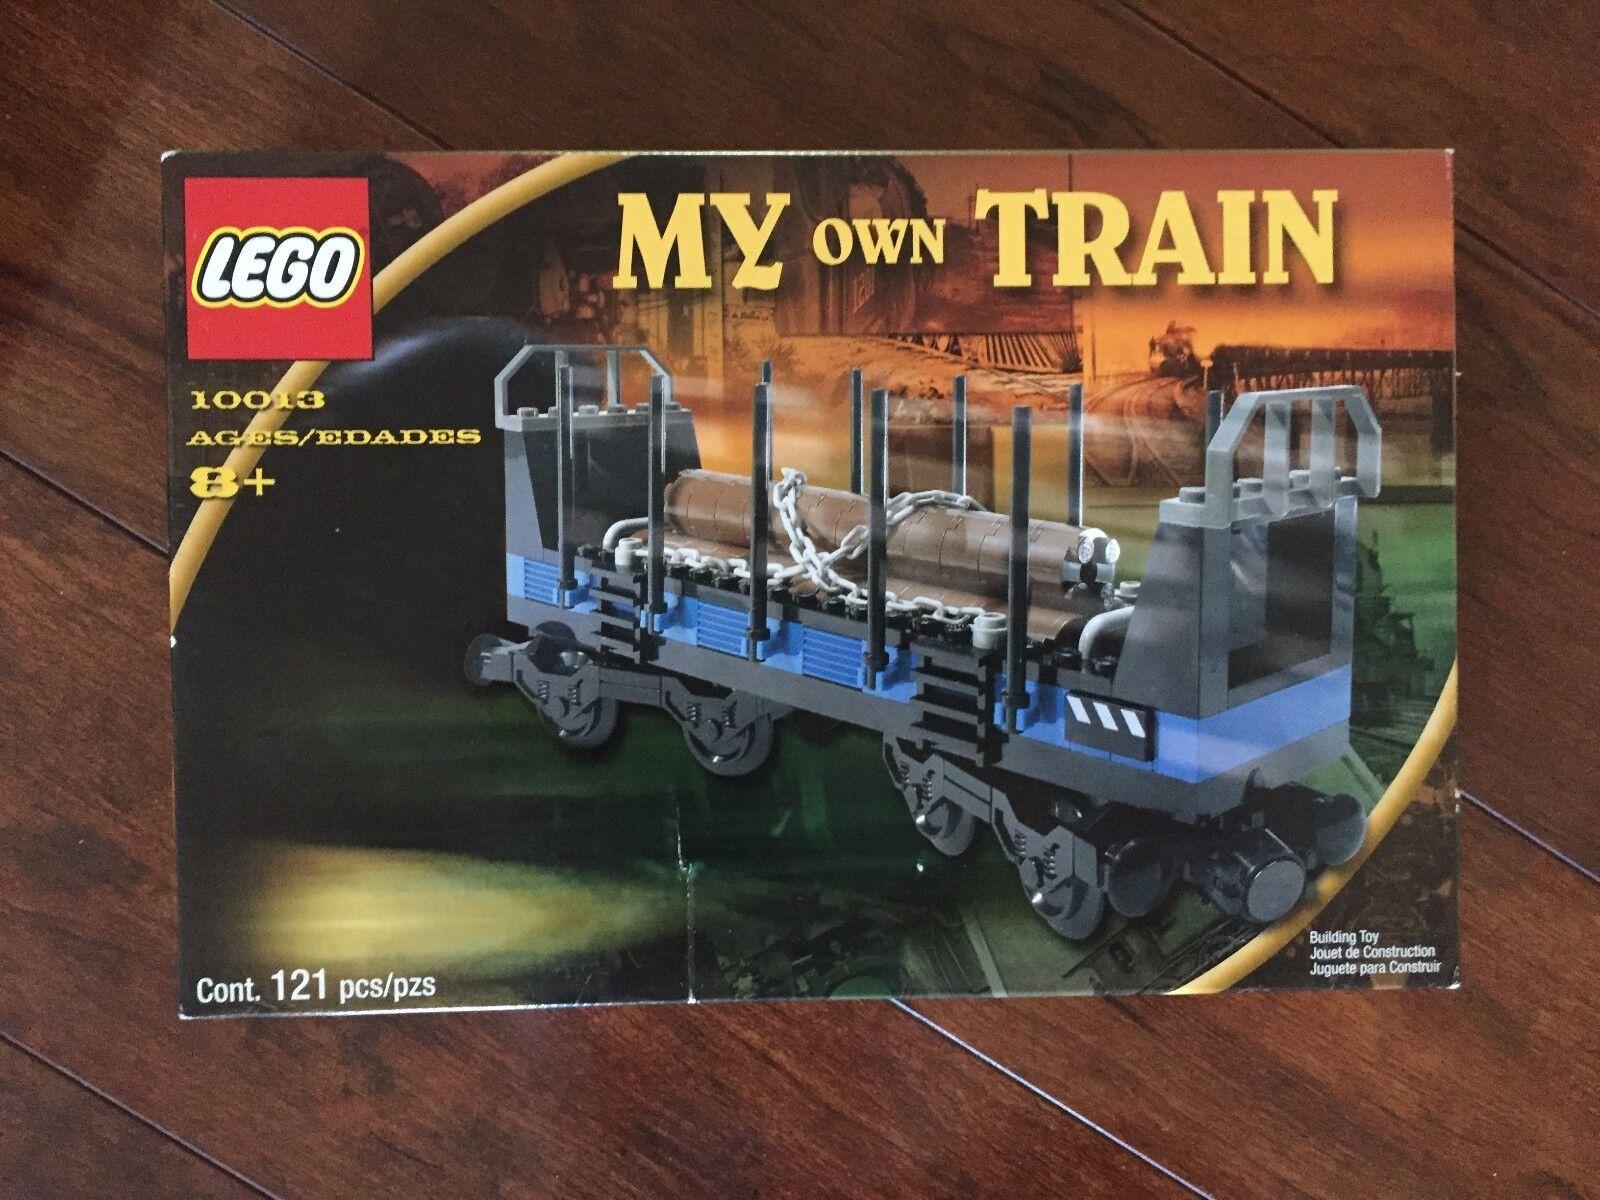 LEGO Train 10013 Mon Propre Train  Open Wagon fret NEUF RARE  voici la dernière